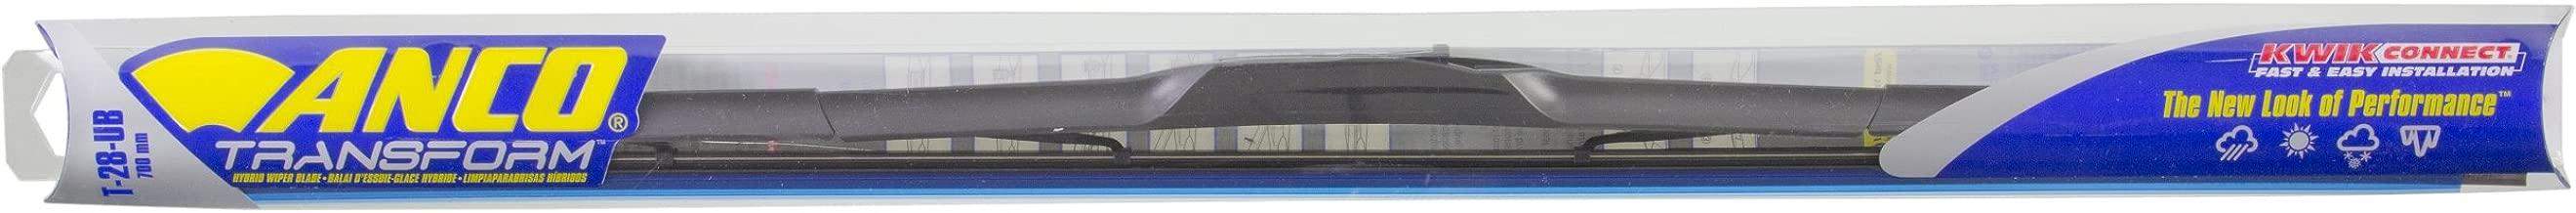 ANCO T-28-UB Transform Hybrid Wiper Blade - 28